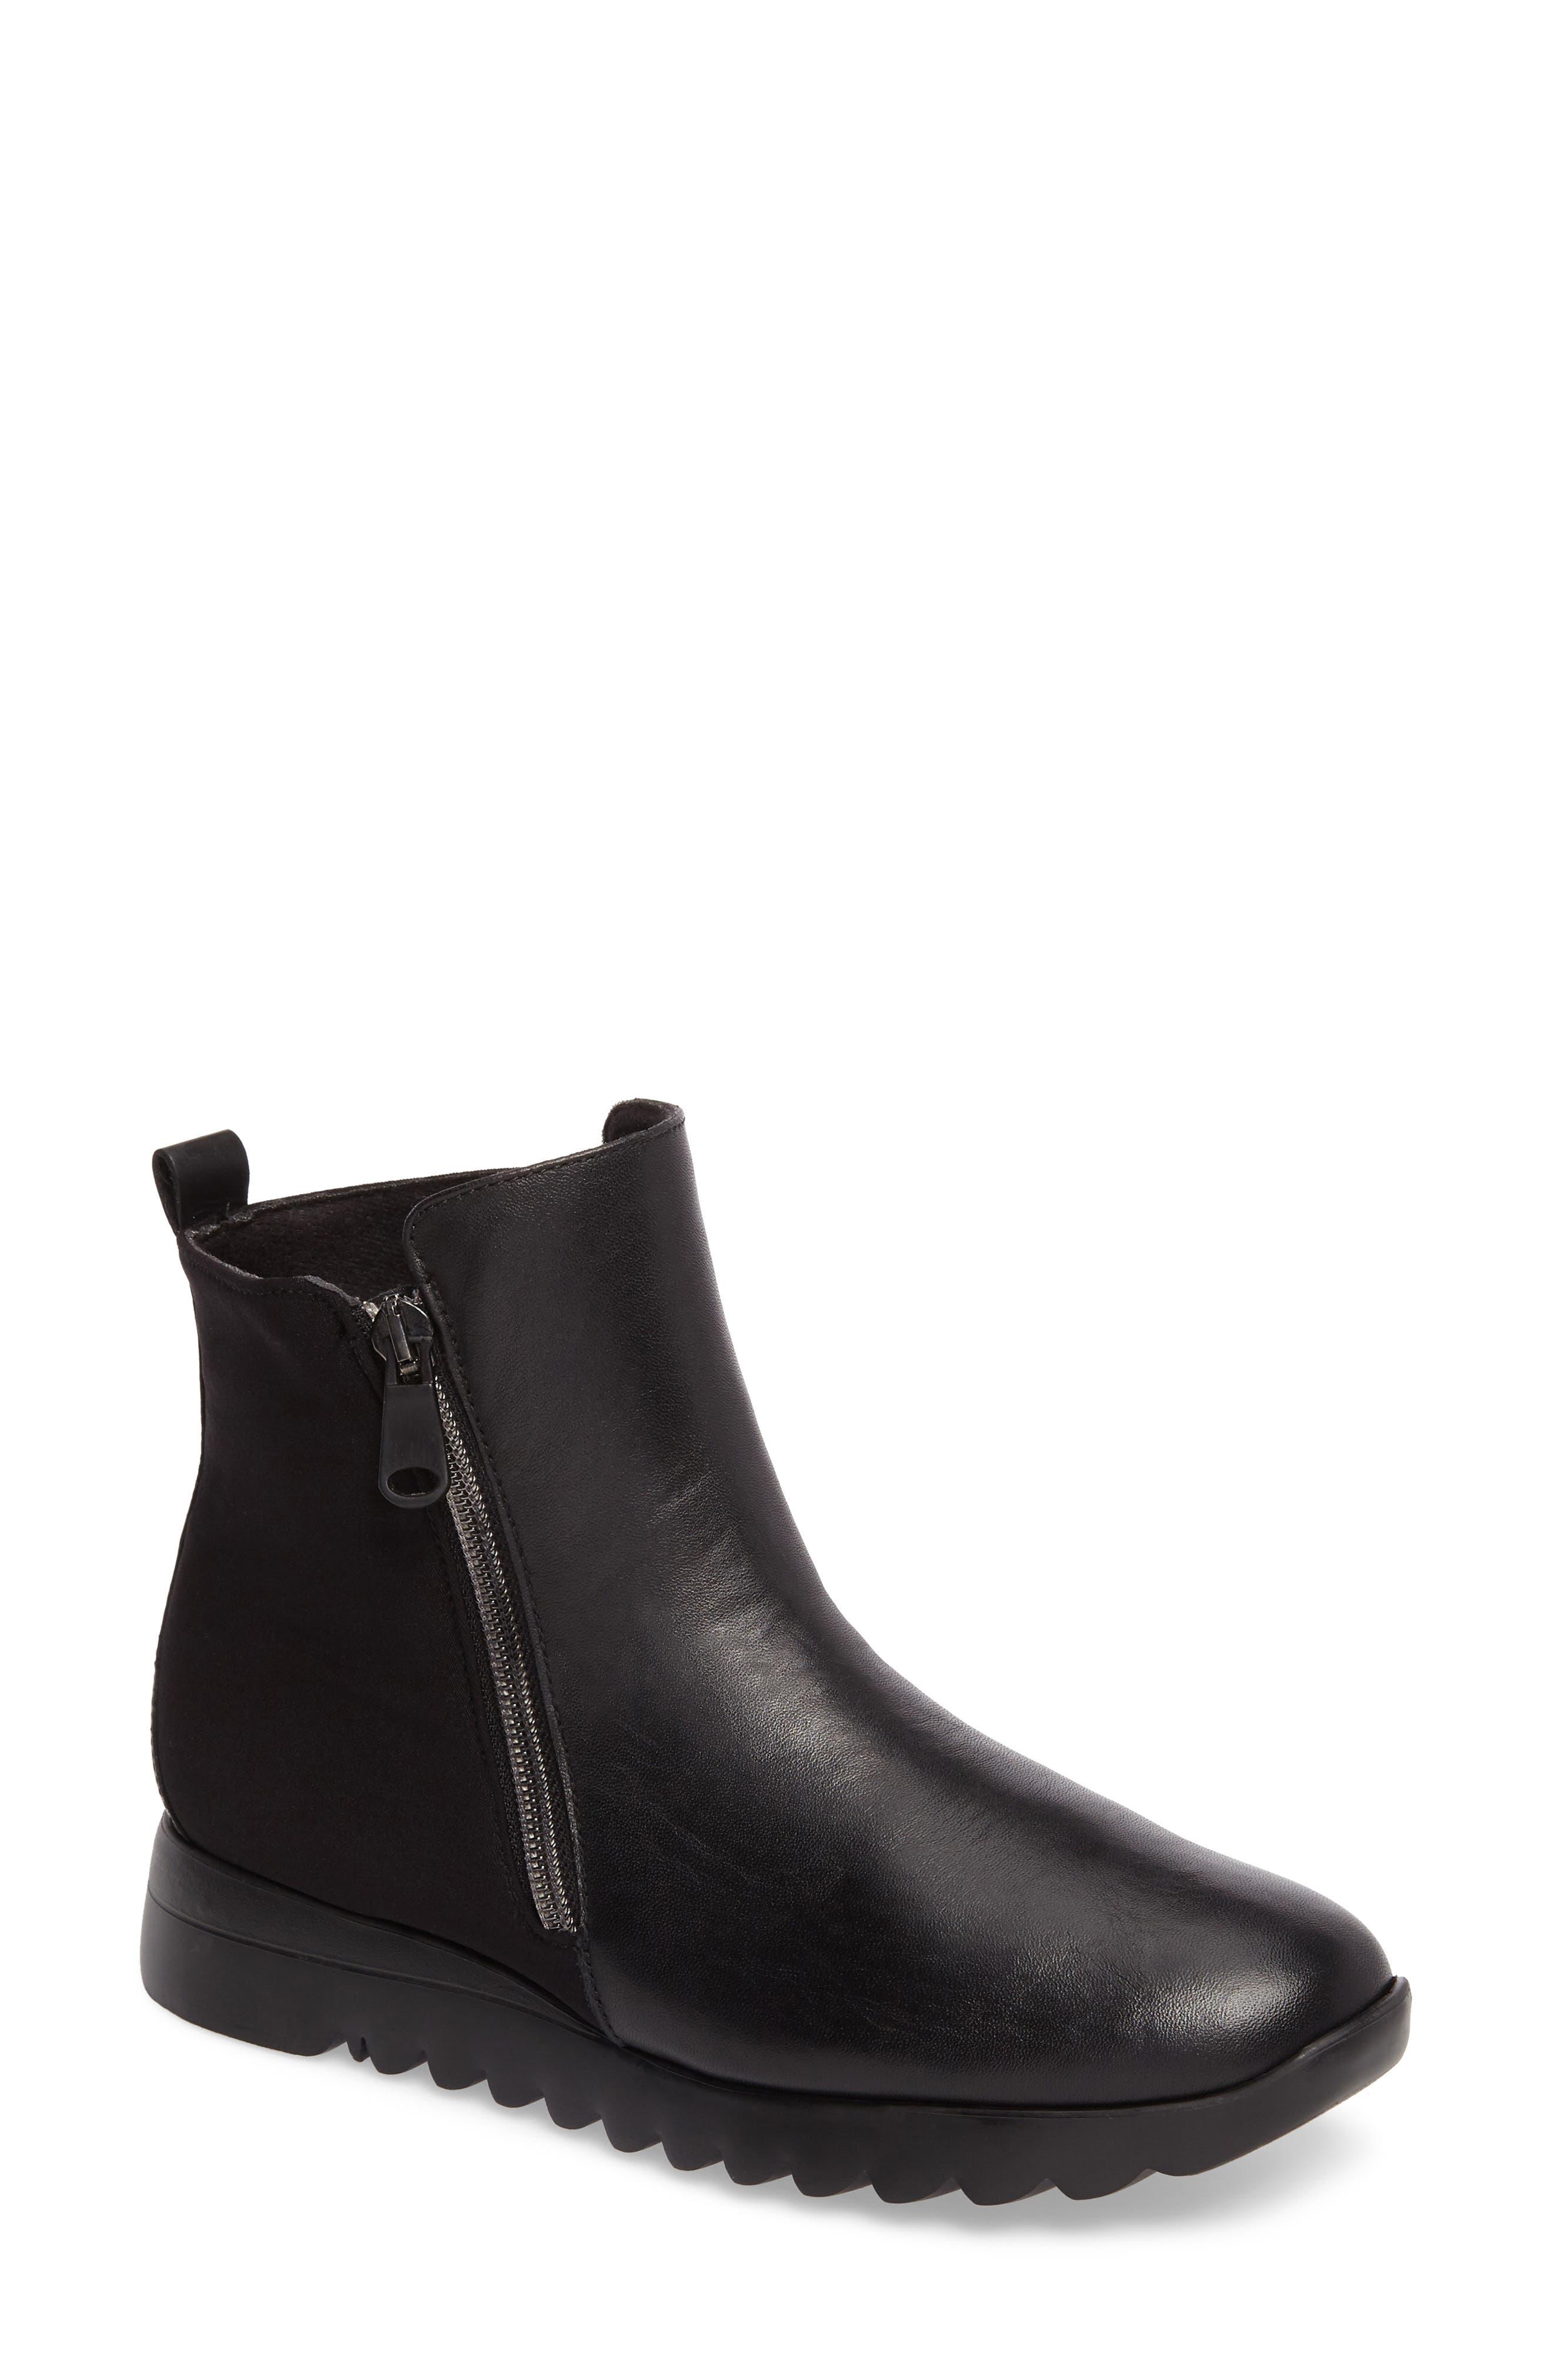 Ashcroft Bootie,                             Main thumbnail 1, color,                             Black Leather